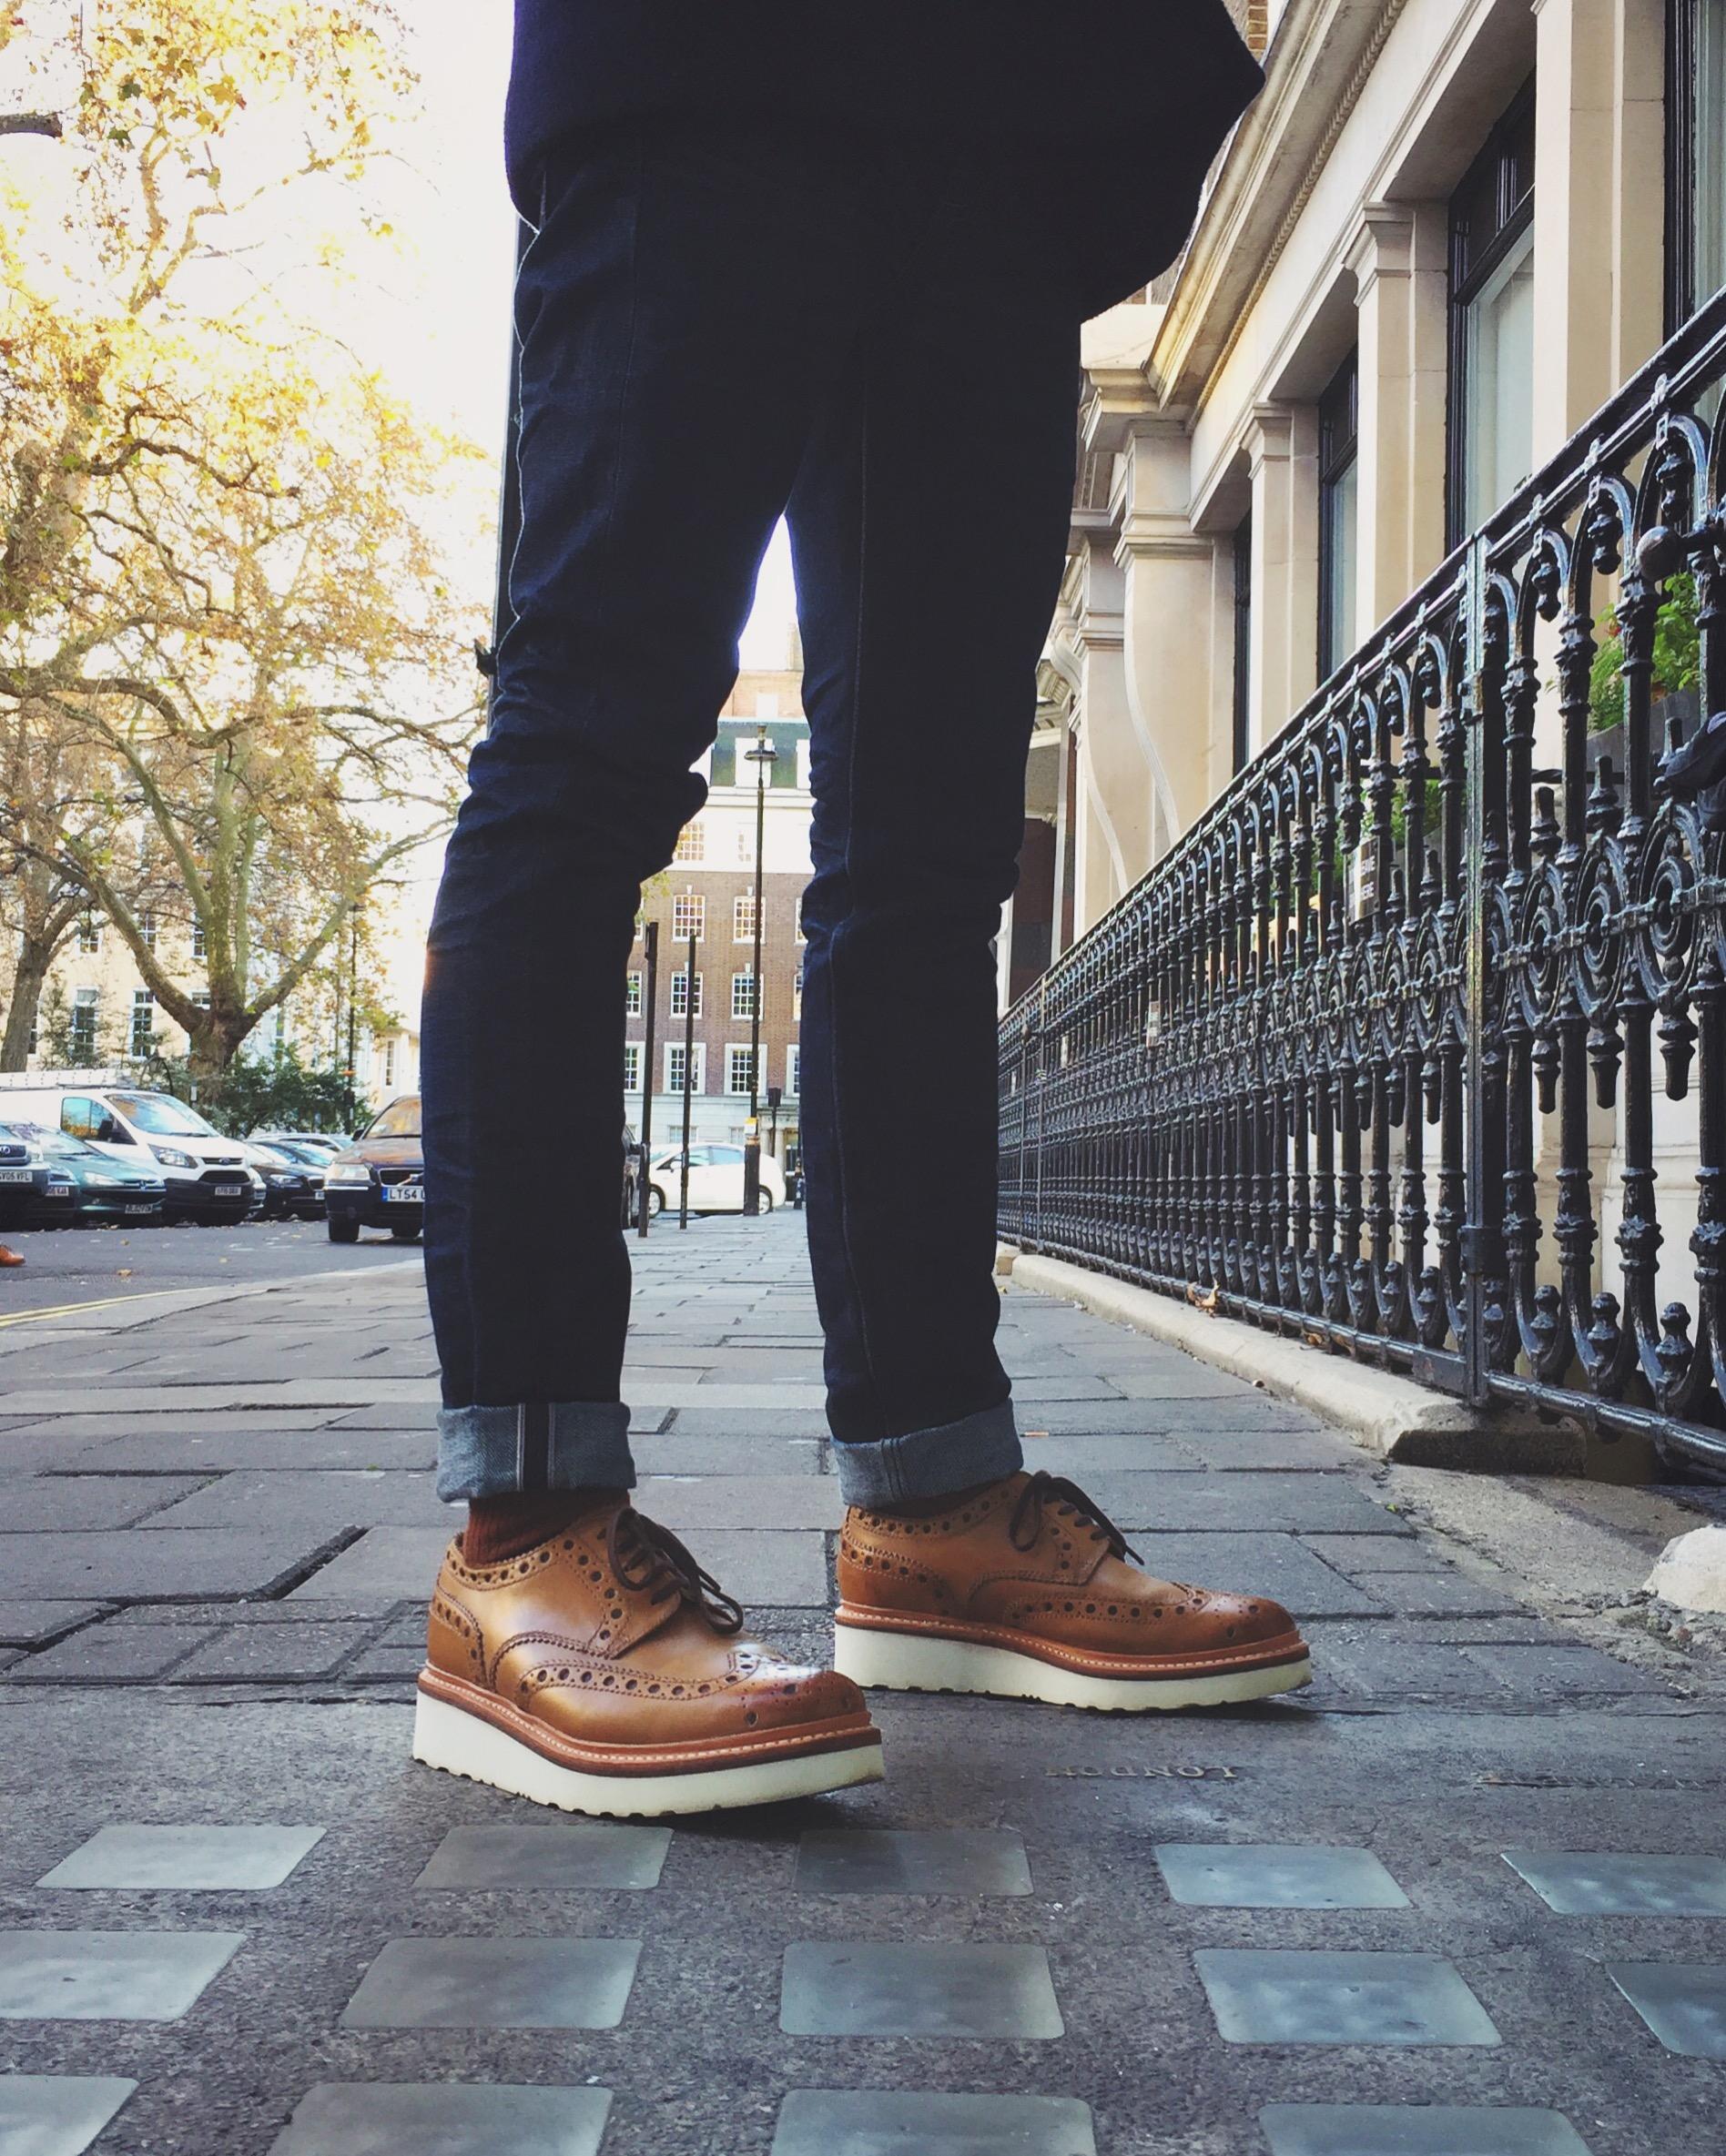 Cs Bartosz Gajec Grenson Archie Shoes.JPG